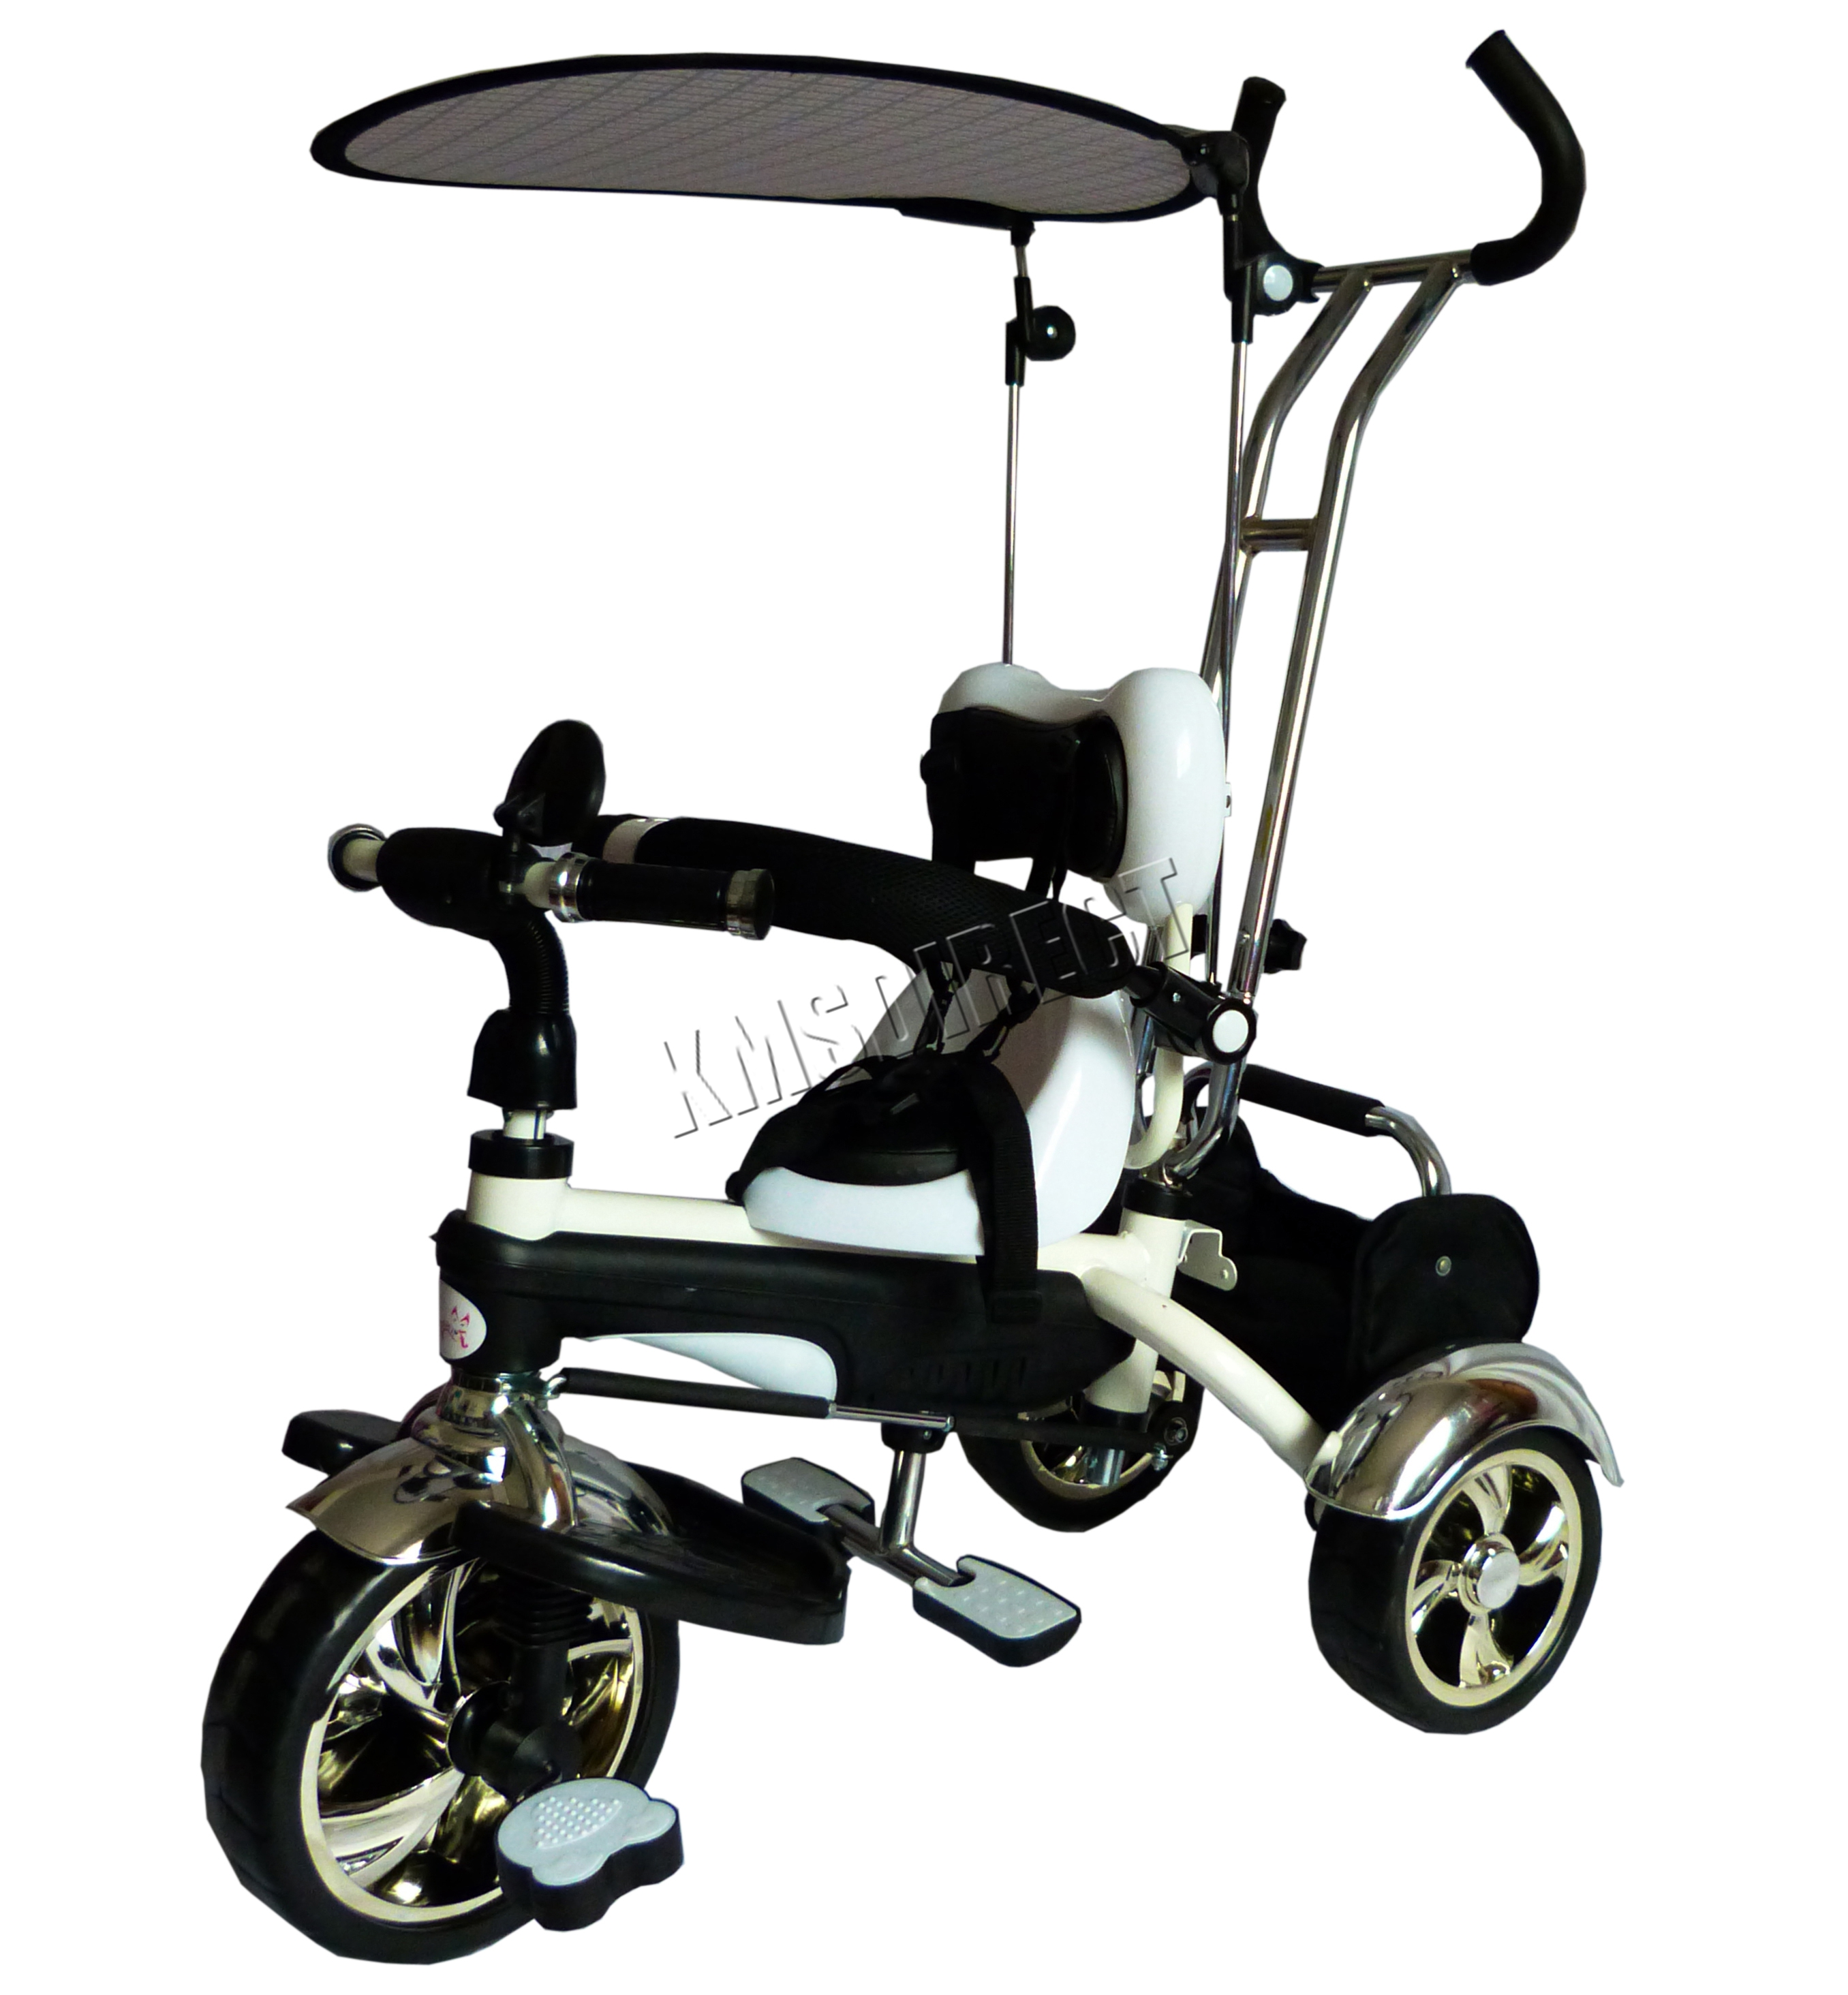 FoxHunter 4In1 Kids Children Trike Tricycle 3 Wheel Ride Bike ...